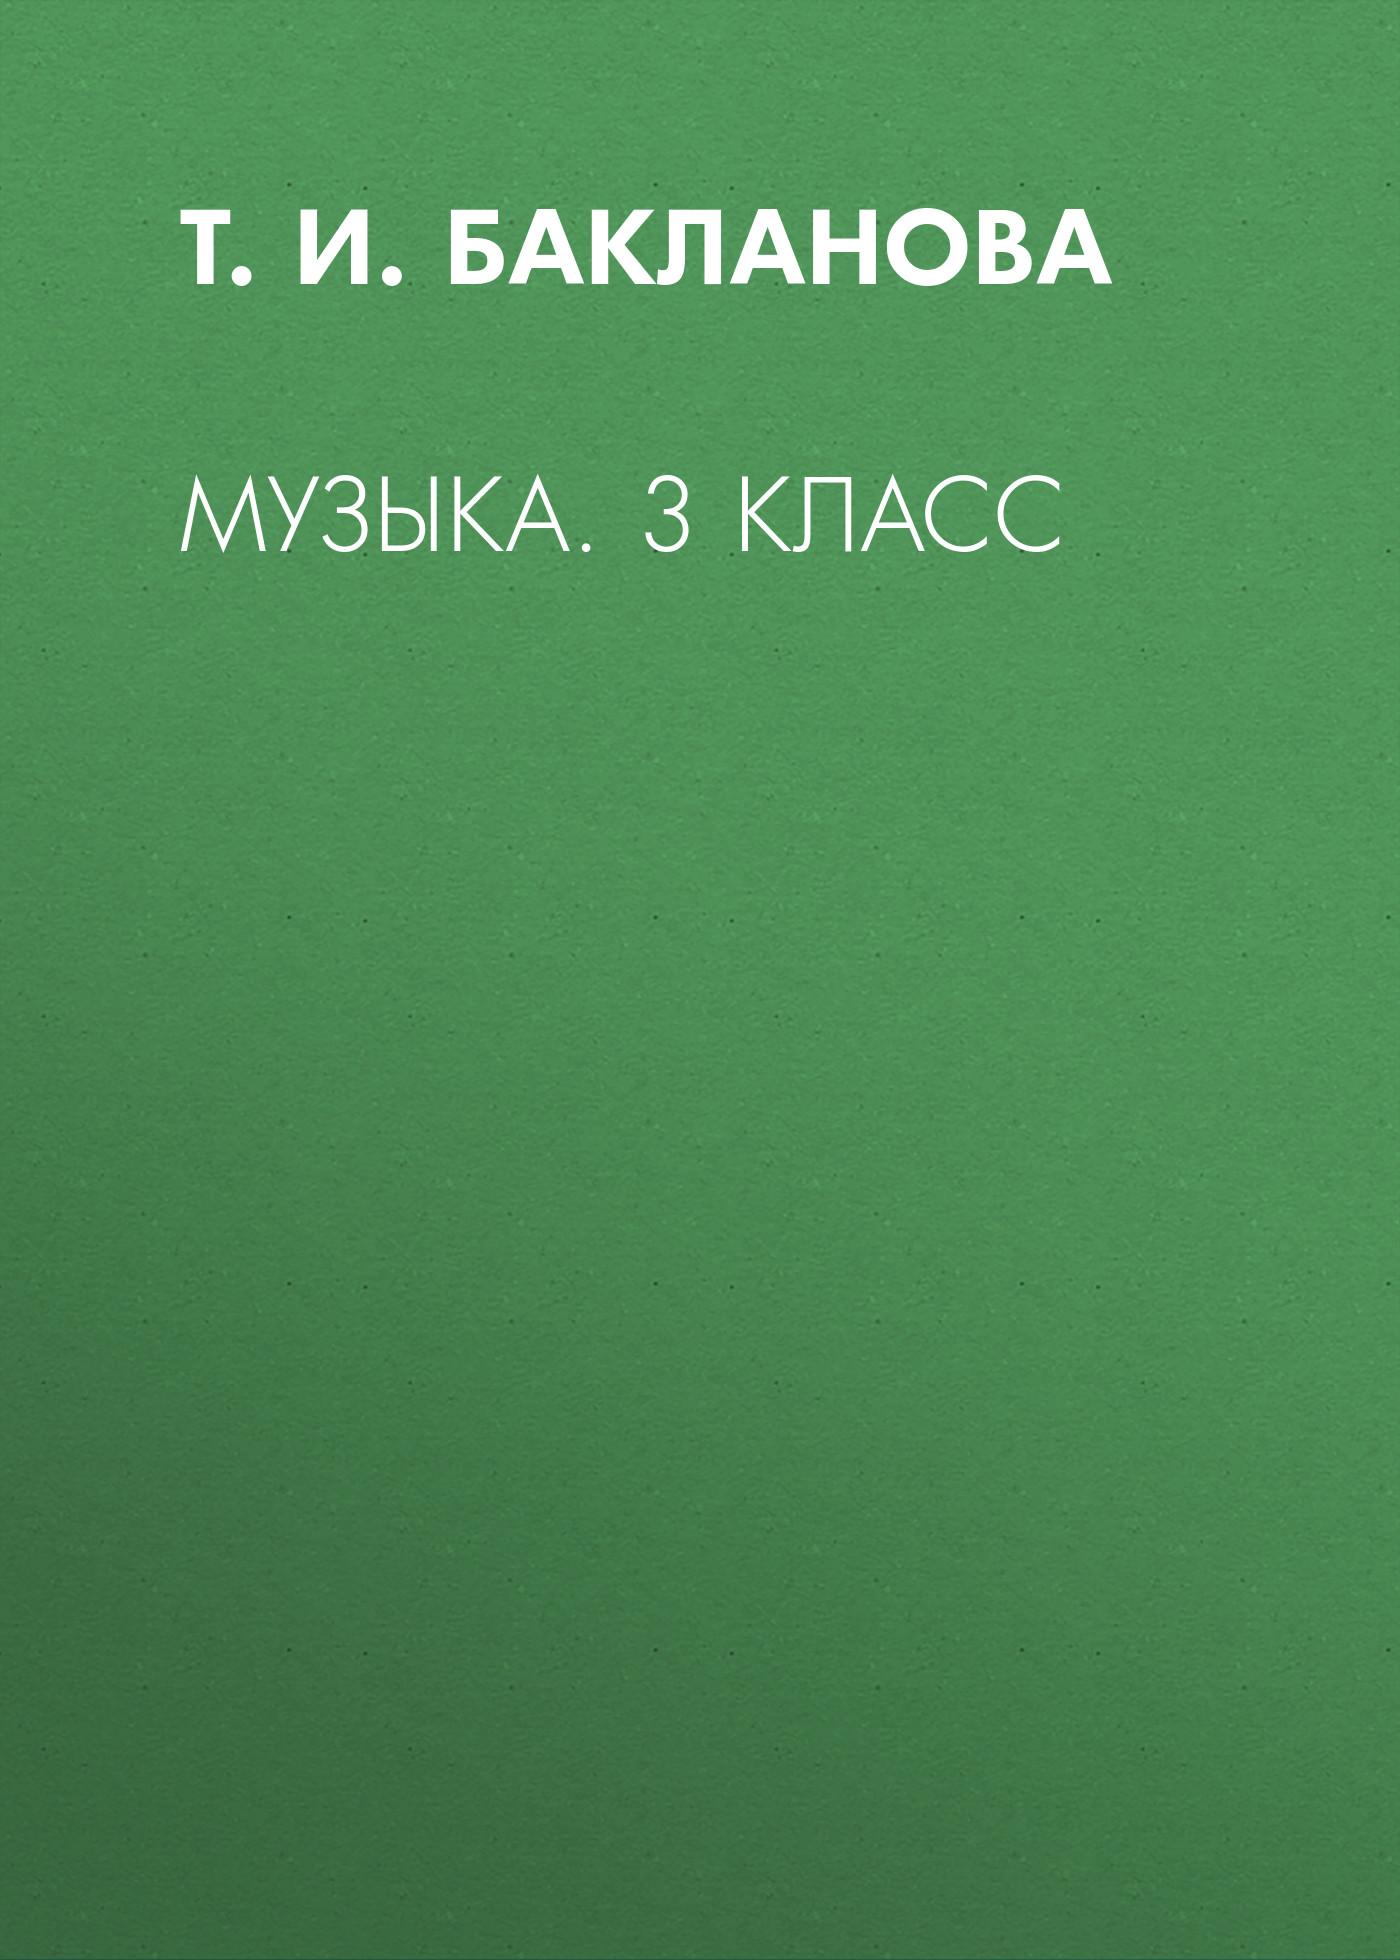 Т. И. Бакланова Музыка. 3 класс бакланова т музыка для детей муз путешествия и встречи isbn 9785170597871